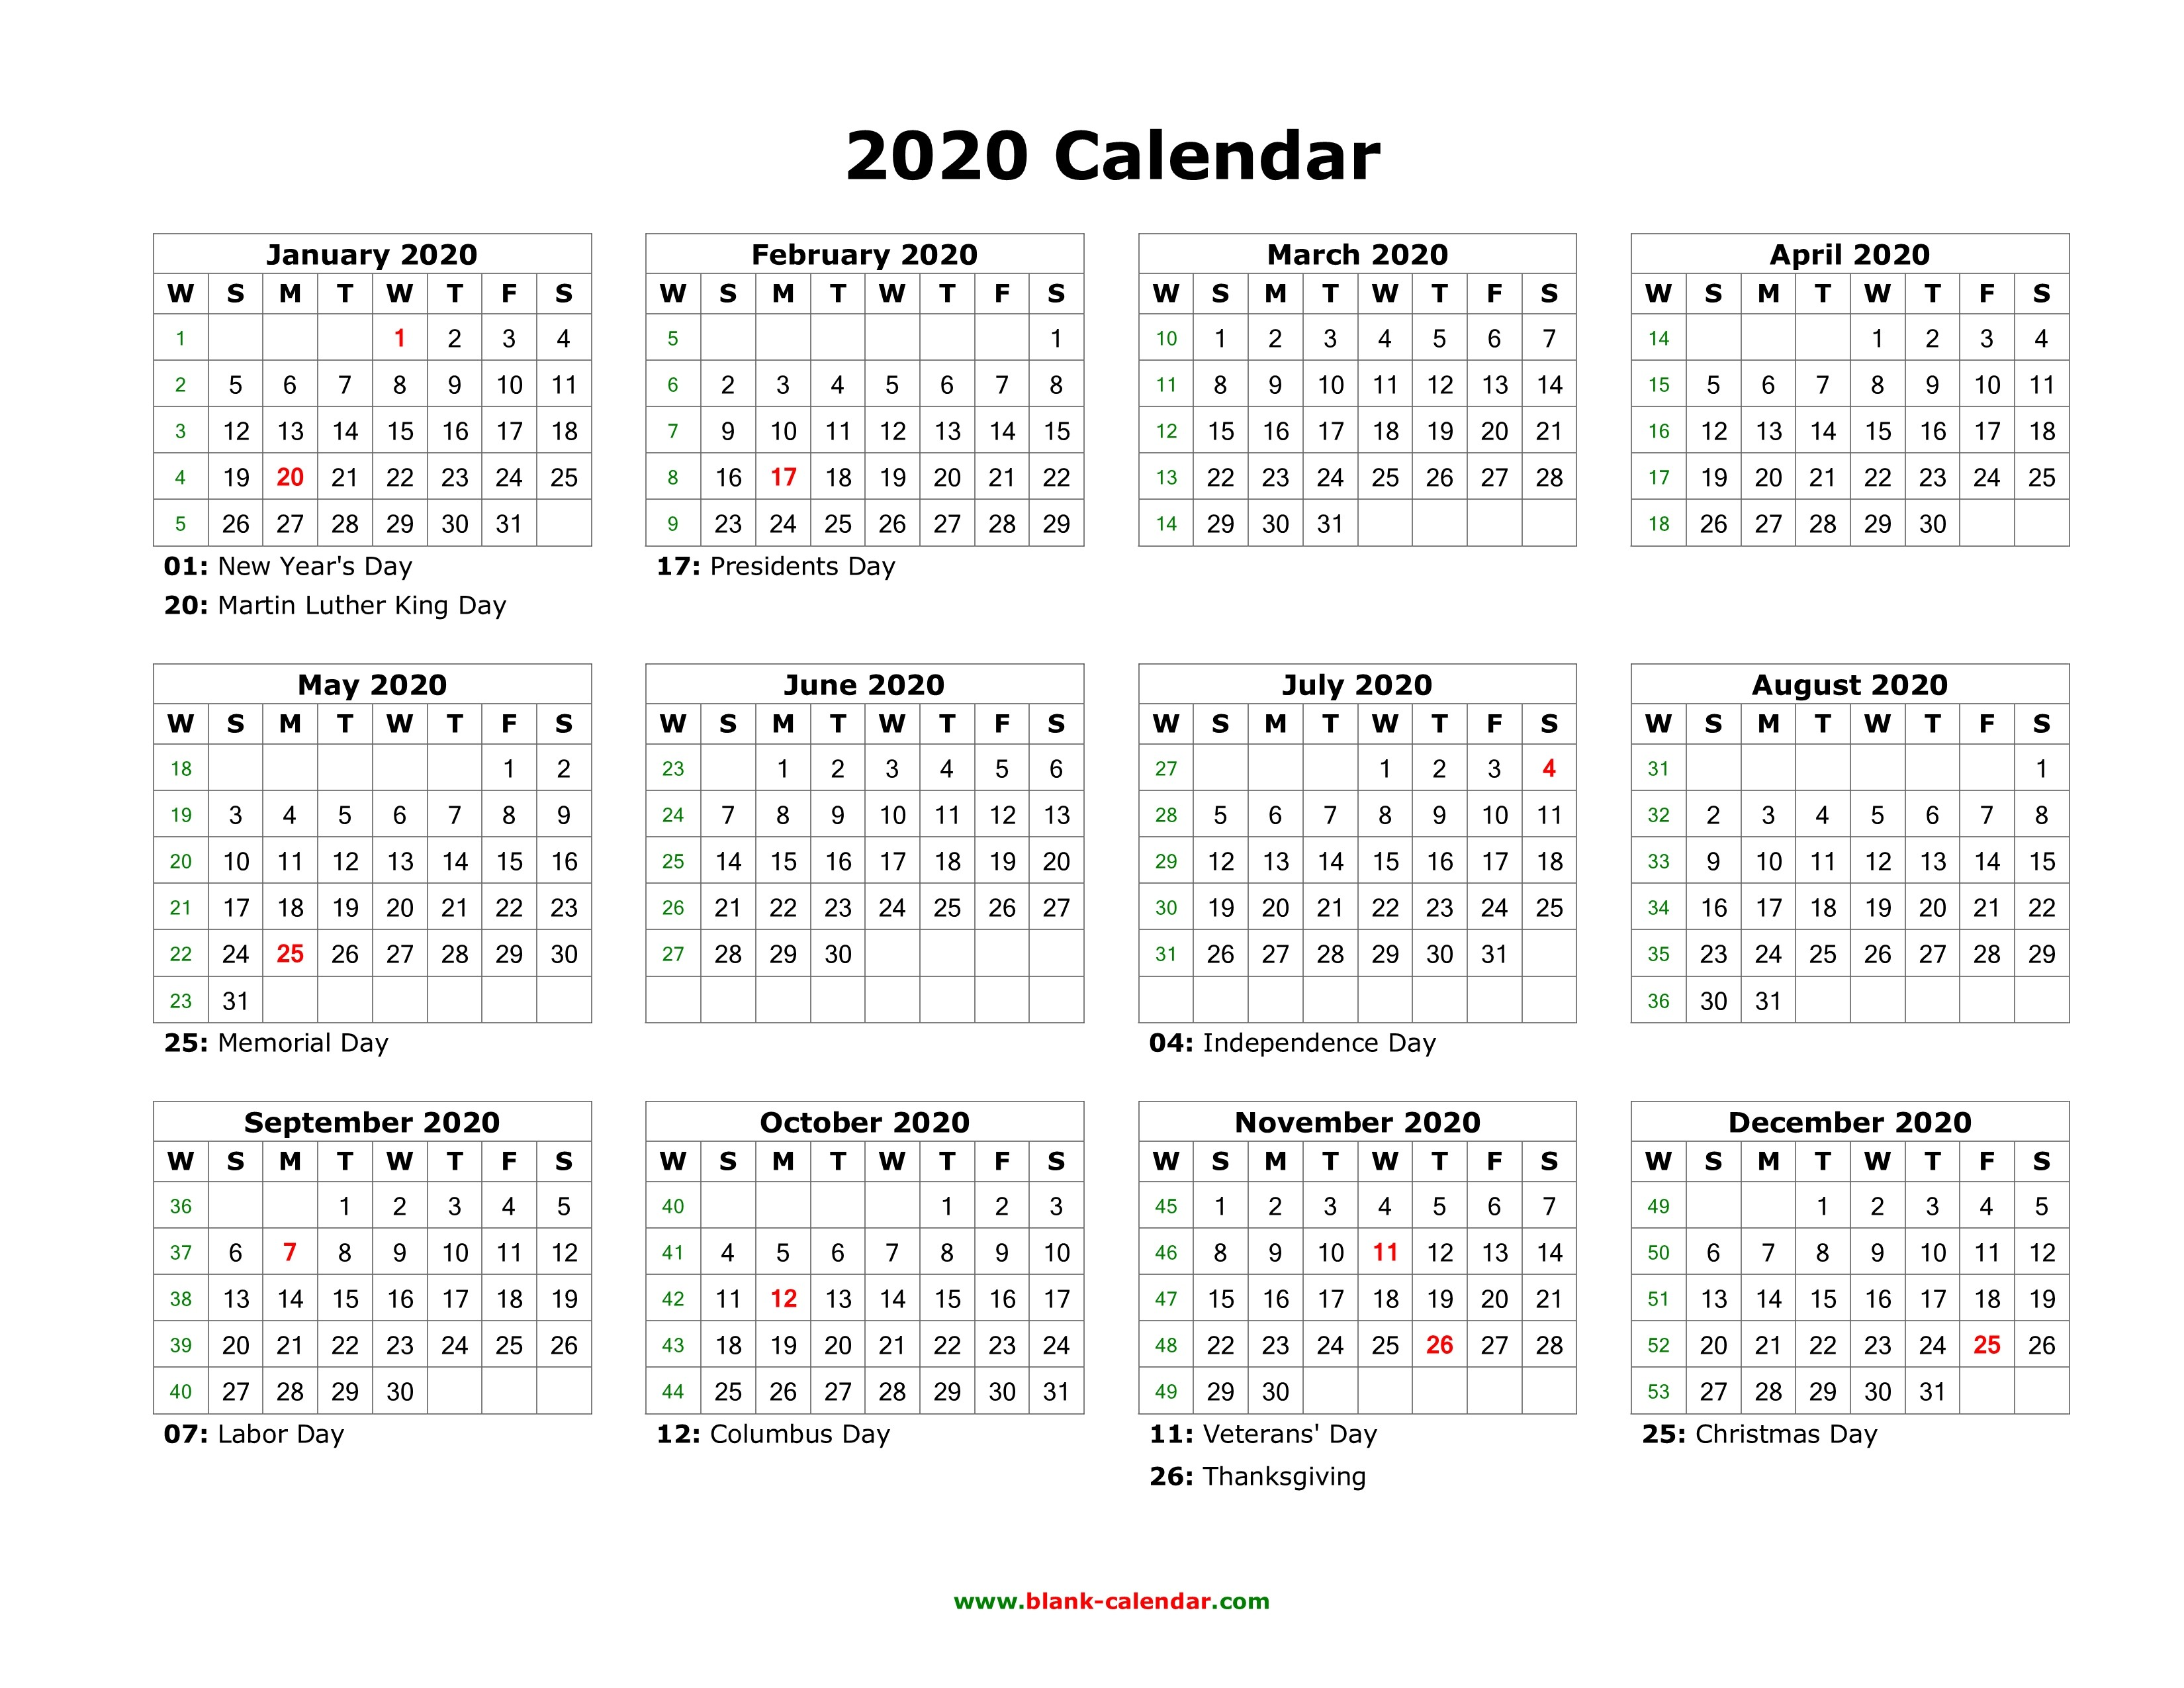 2020 Blank Monthly Calendar Printable Blank Calendar 2020